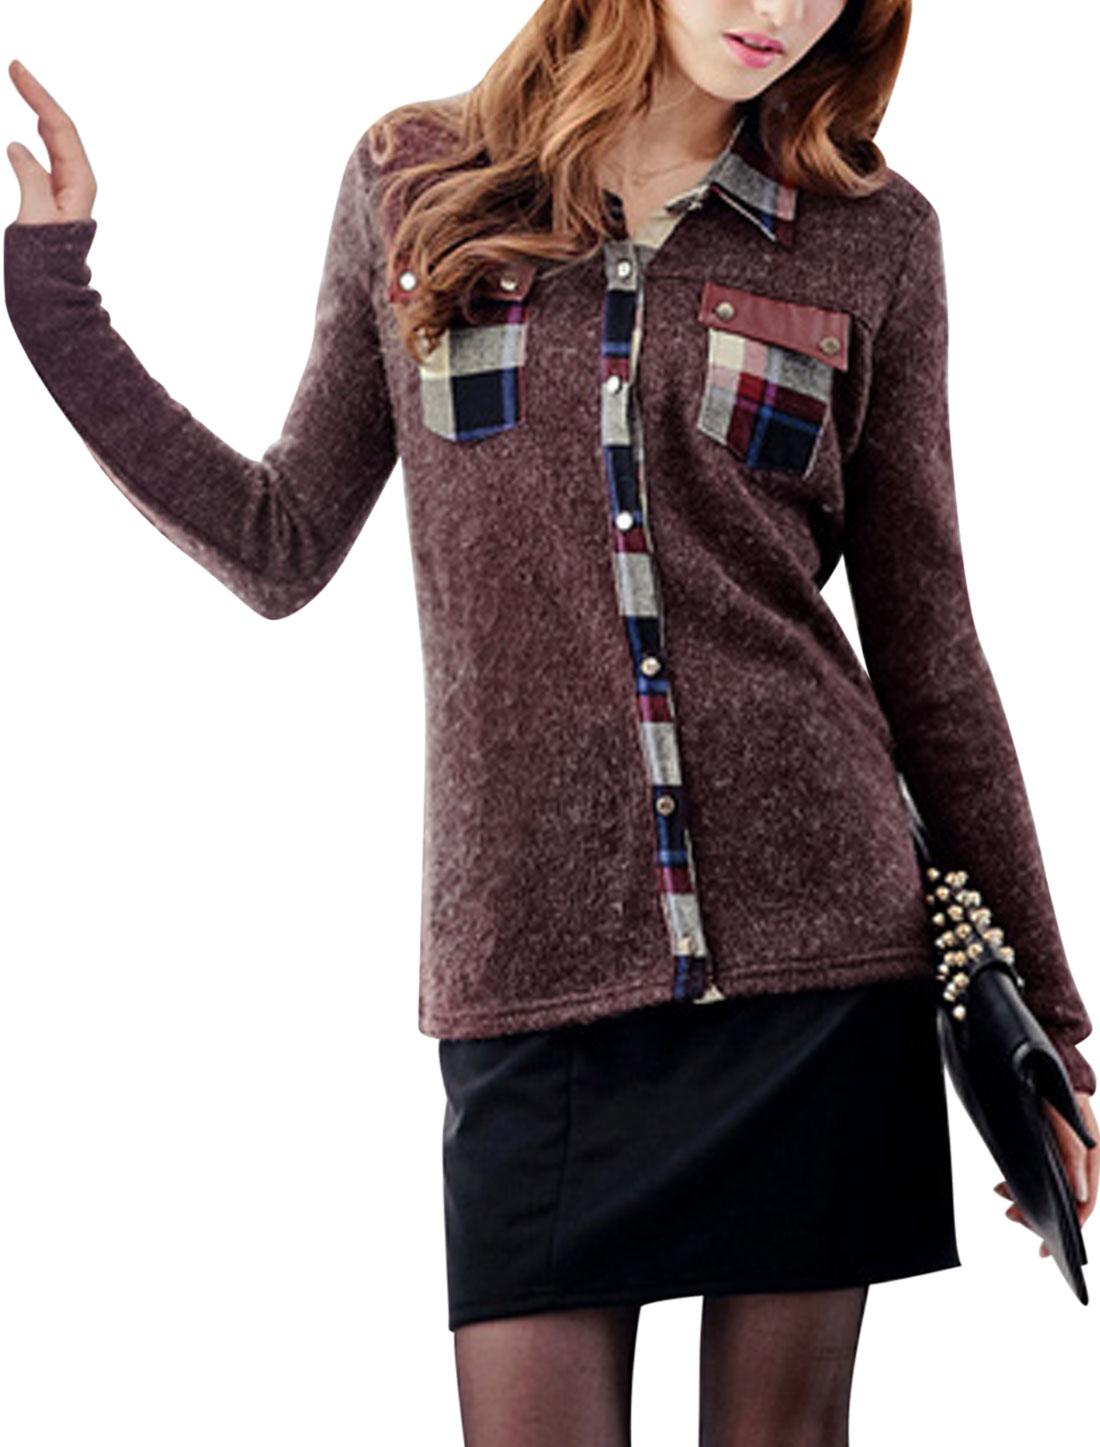 Ladies Dark Burgundy Long Sleeves Single Breasted Point Collar Splice Shirt S